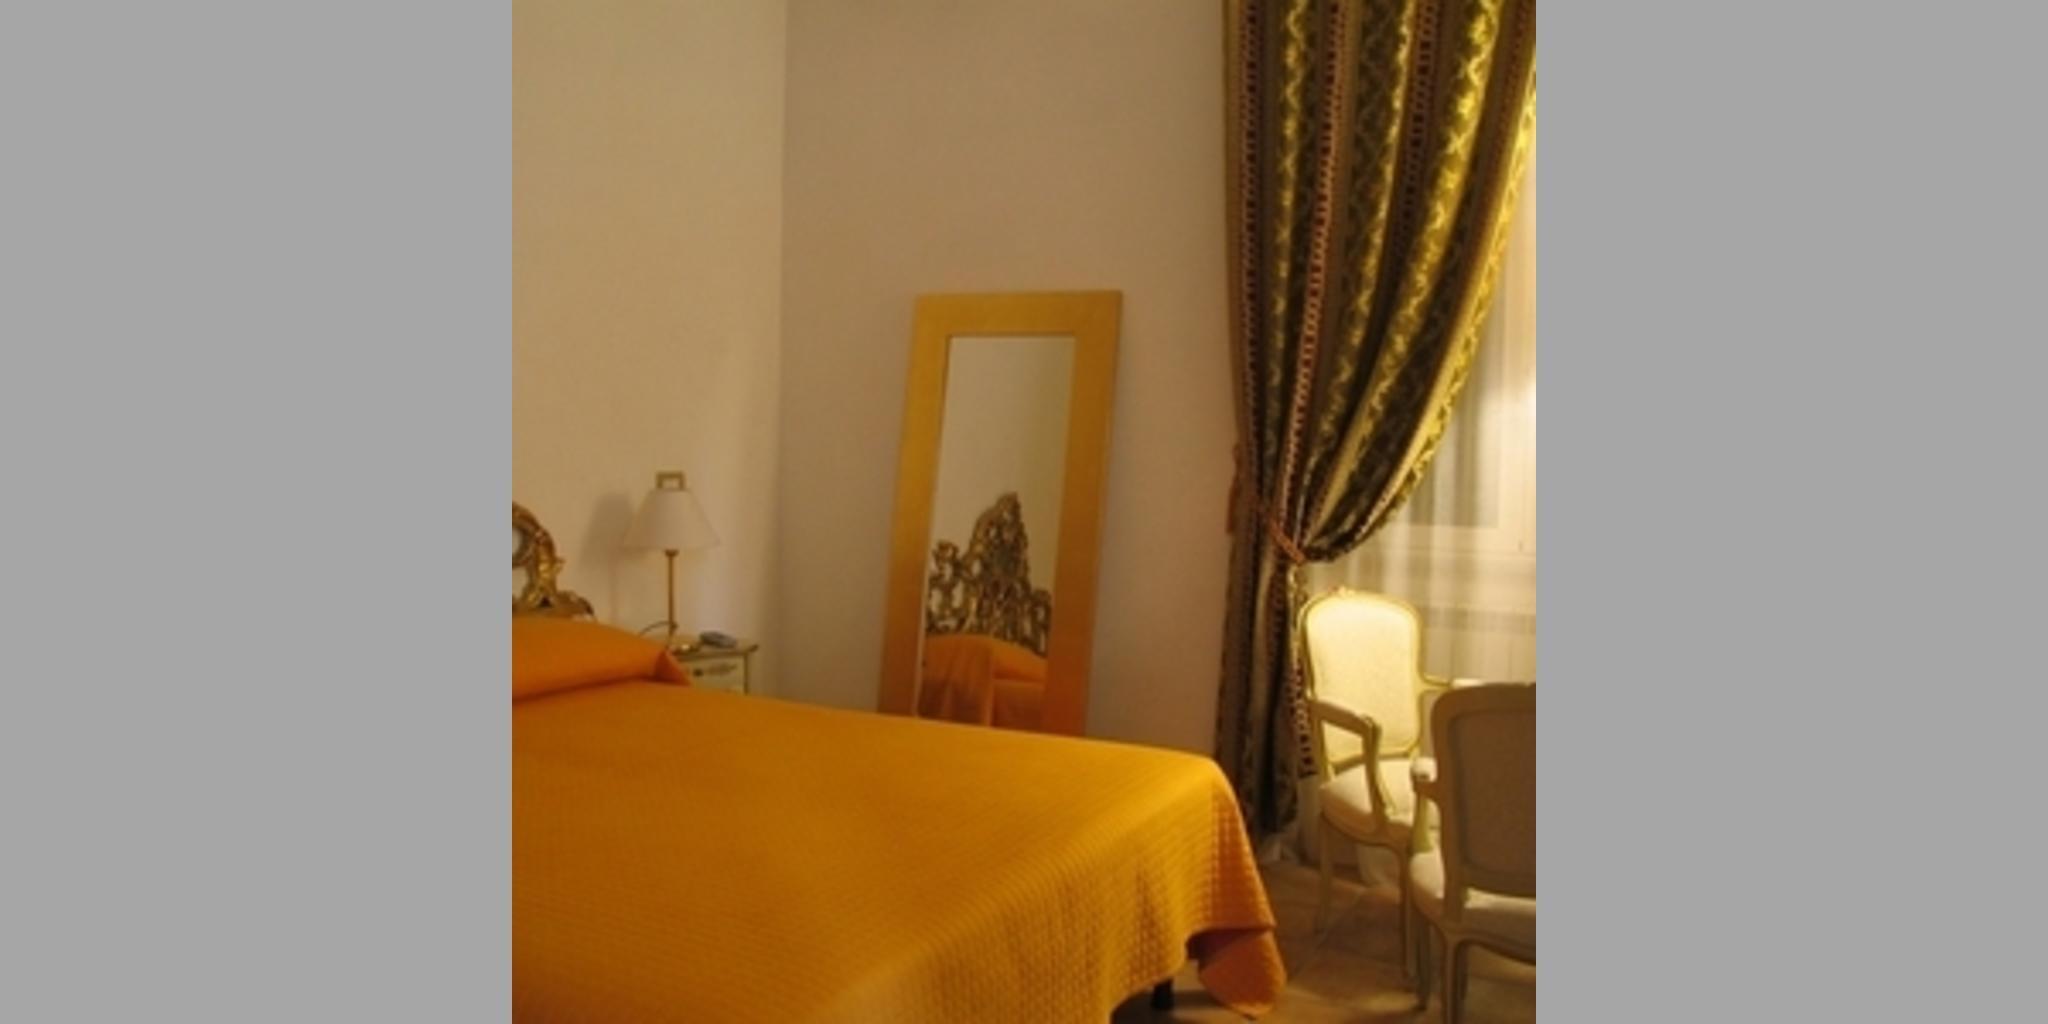 Guest House Roma - Termini_Giolitti_A